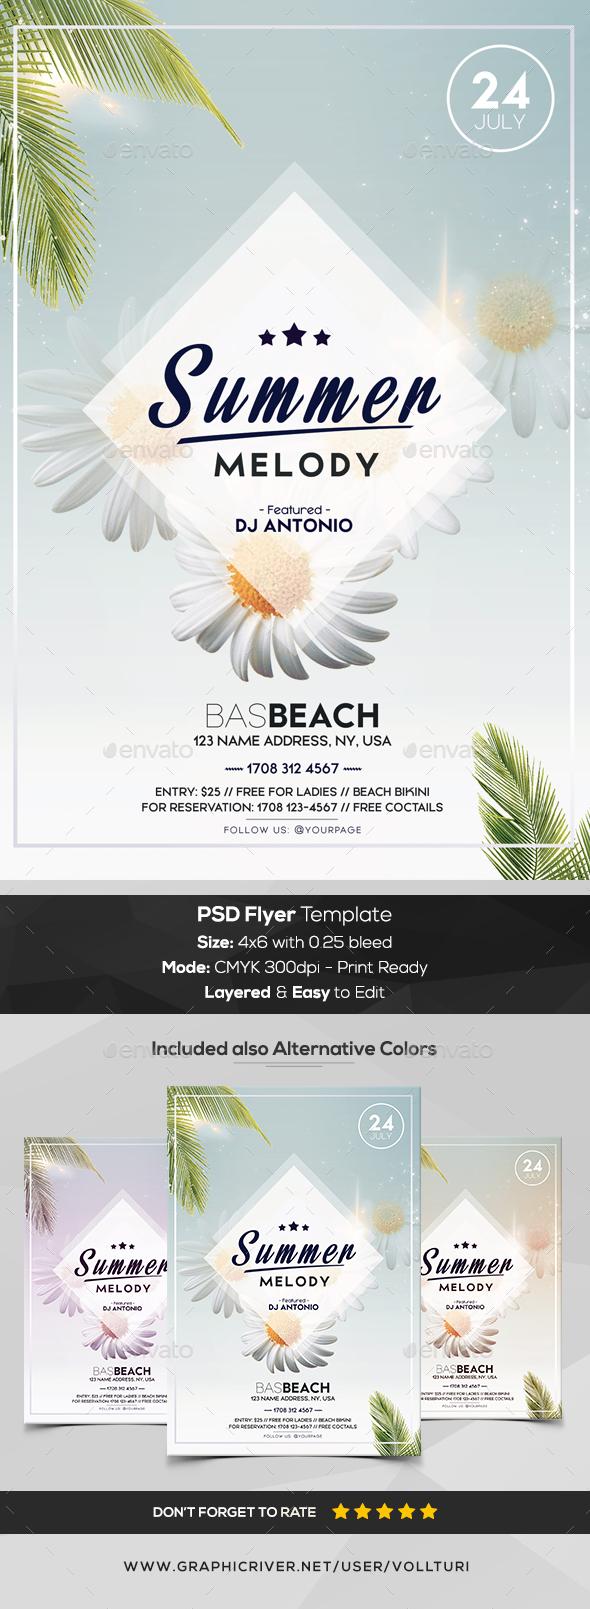 Summer Melody - Minimal PSD Flyer Template - Flyers Print Templates